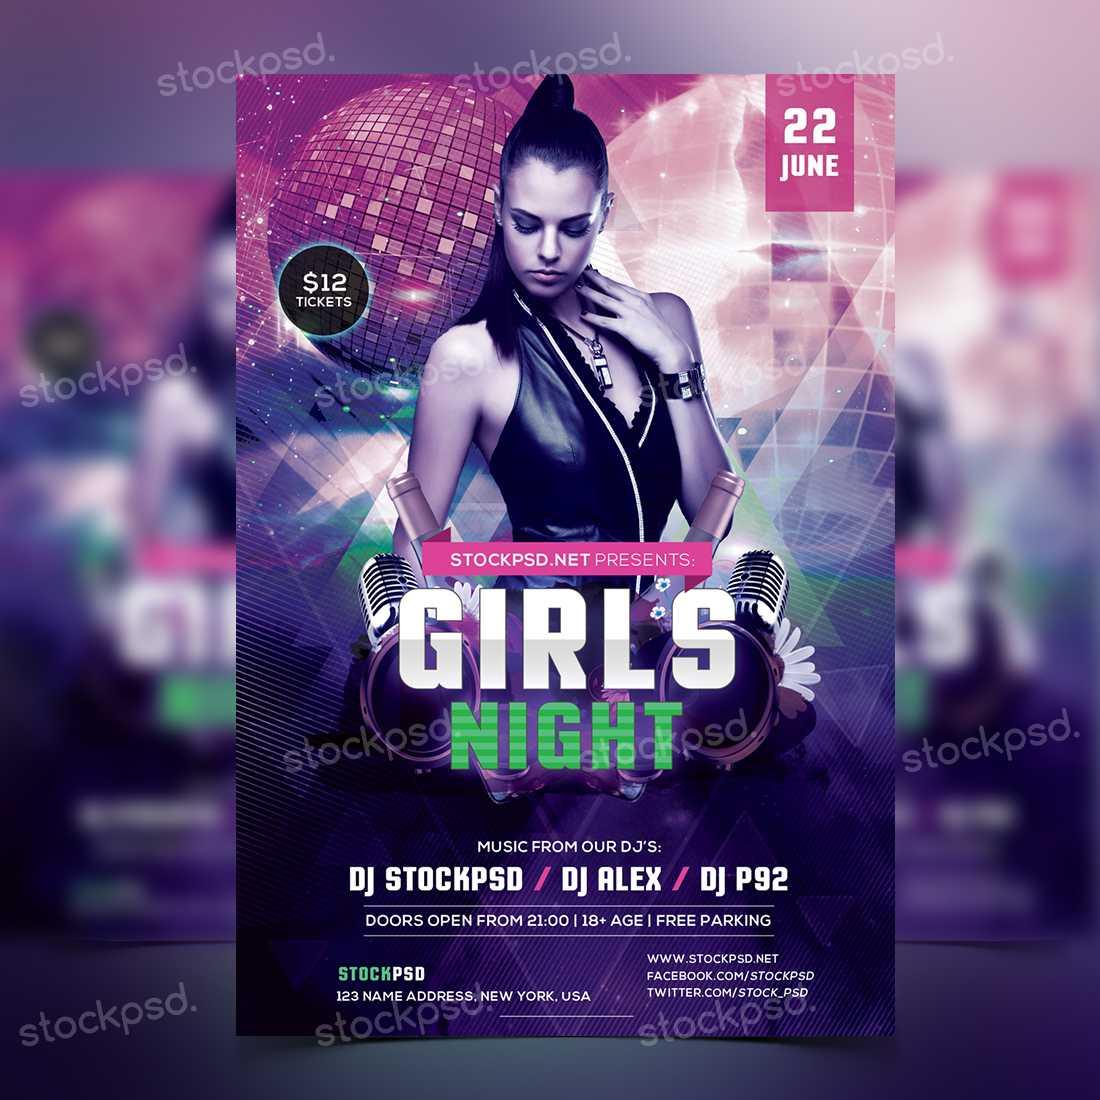 038 Free Nightclub Flyer Templates Template Striking Ideas Pertaining To Free Nightclub Flyer Templates